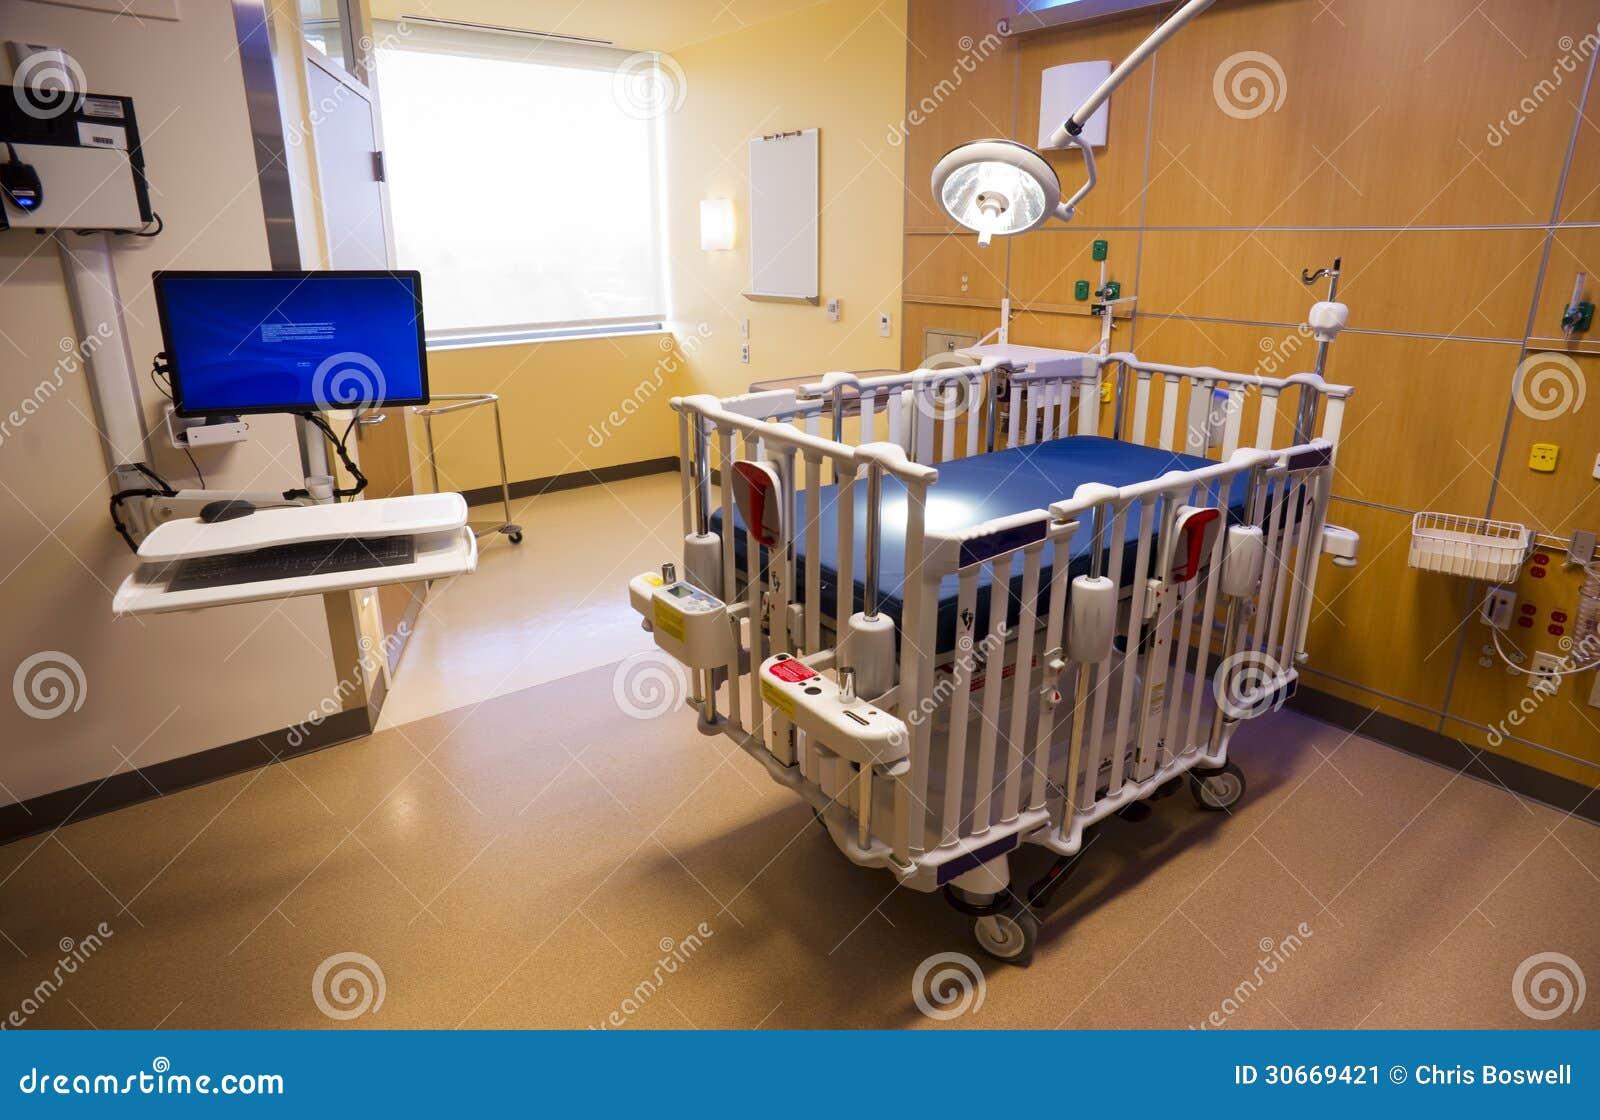 Next Childrens Bedrooms Medical Inspection Light Shines Down Bed Childrens Hospital Room